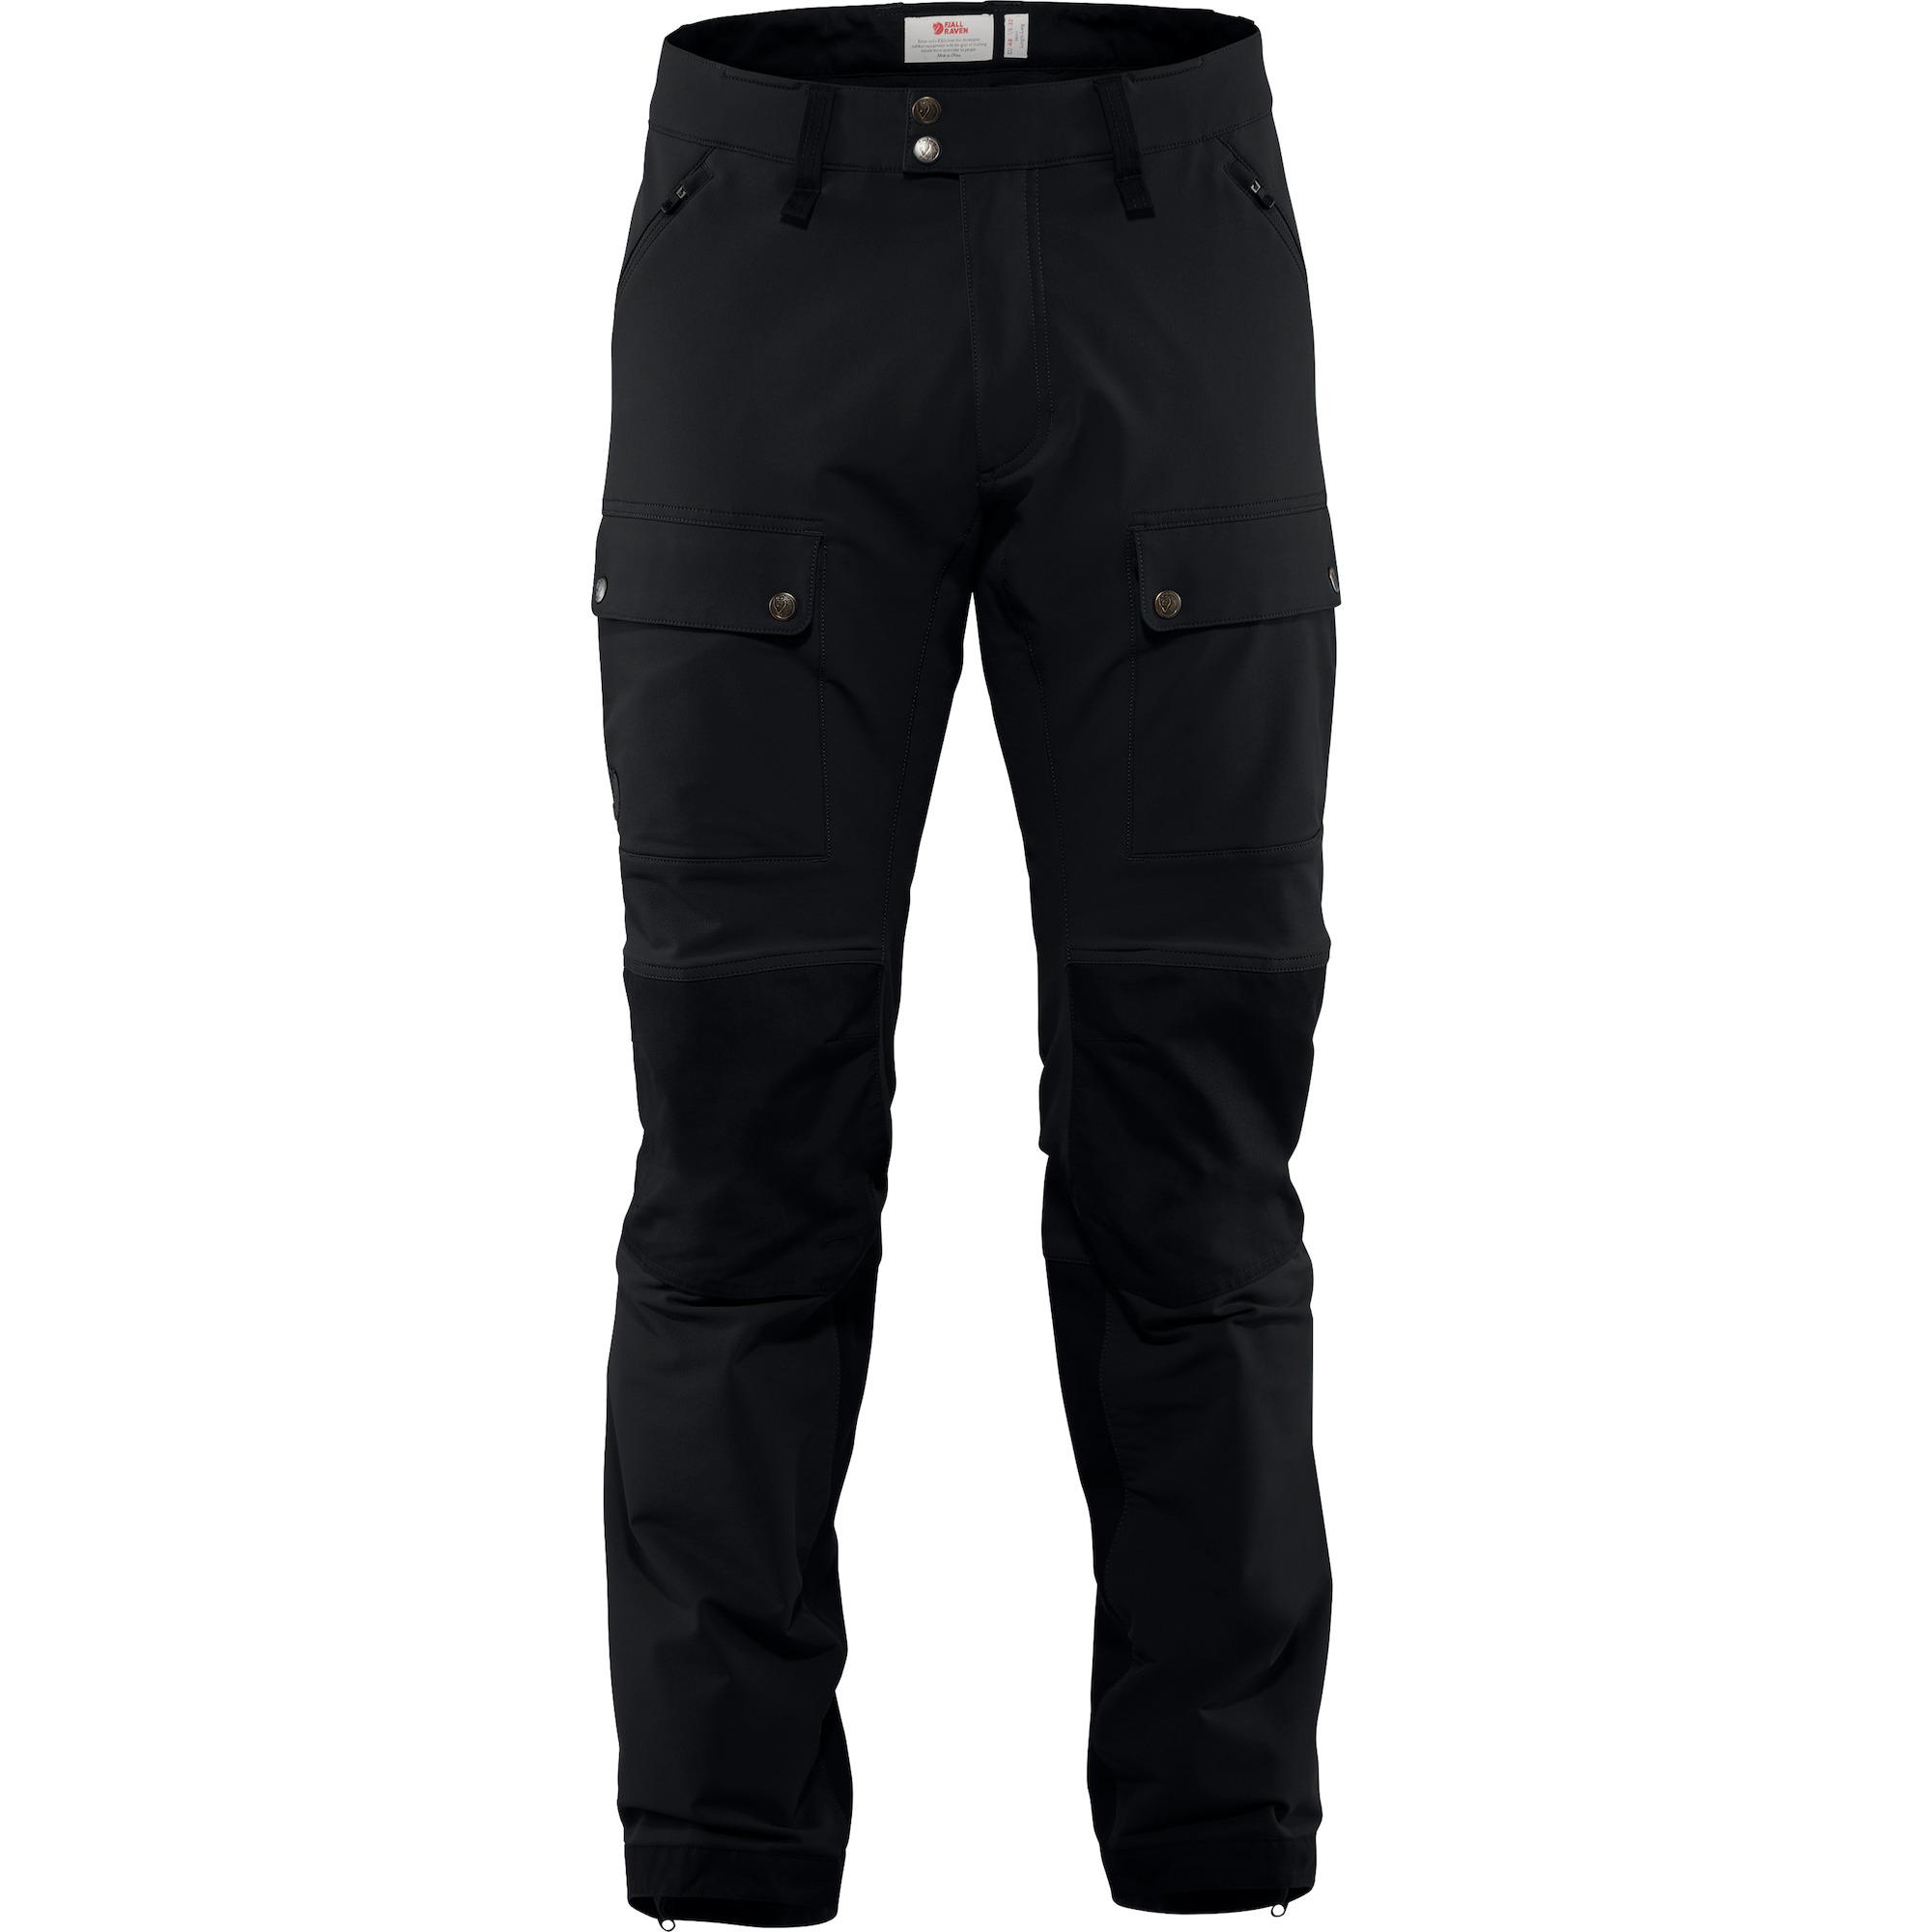 Fjäll Räven Keb Trouser Men Glacier Green Sturdy Hiking Trousers for Men